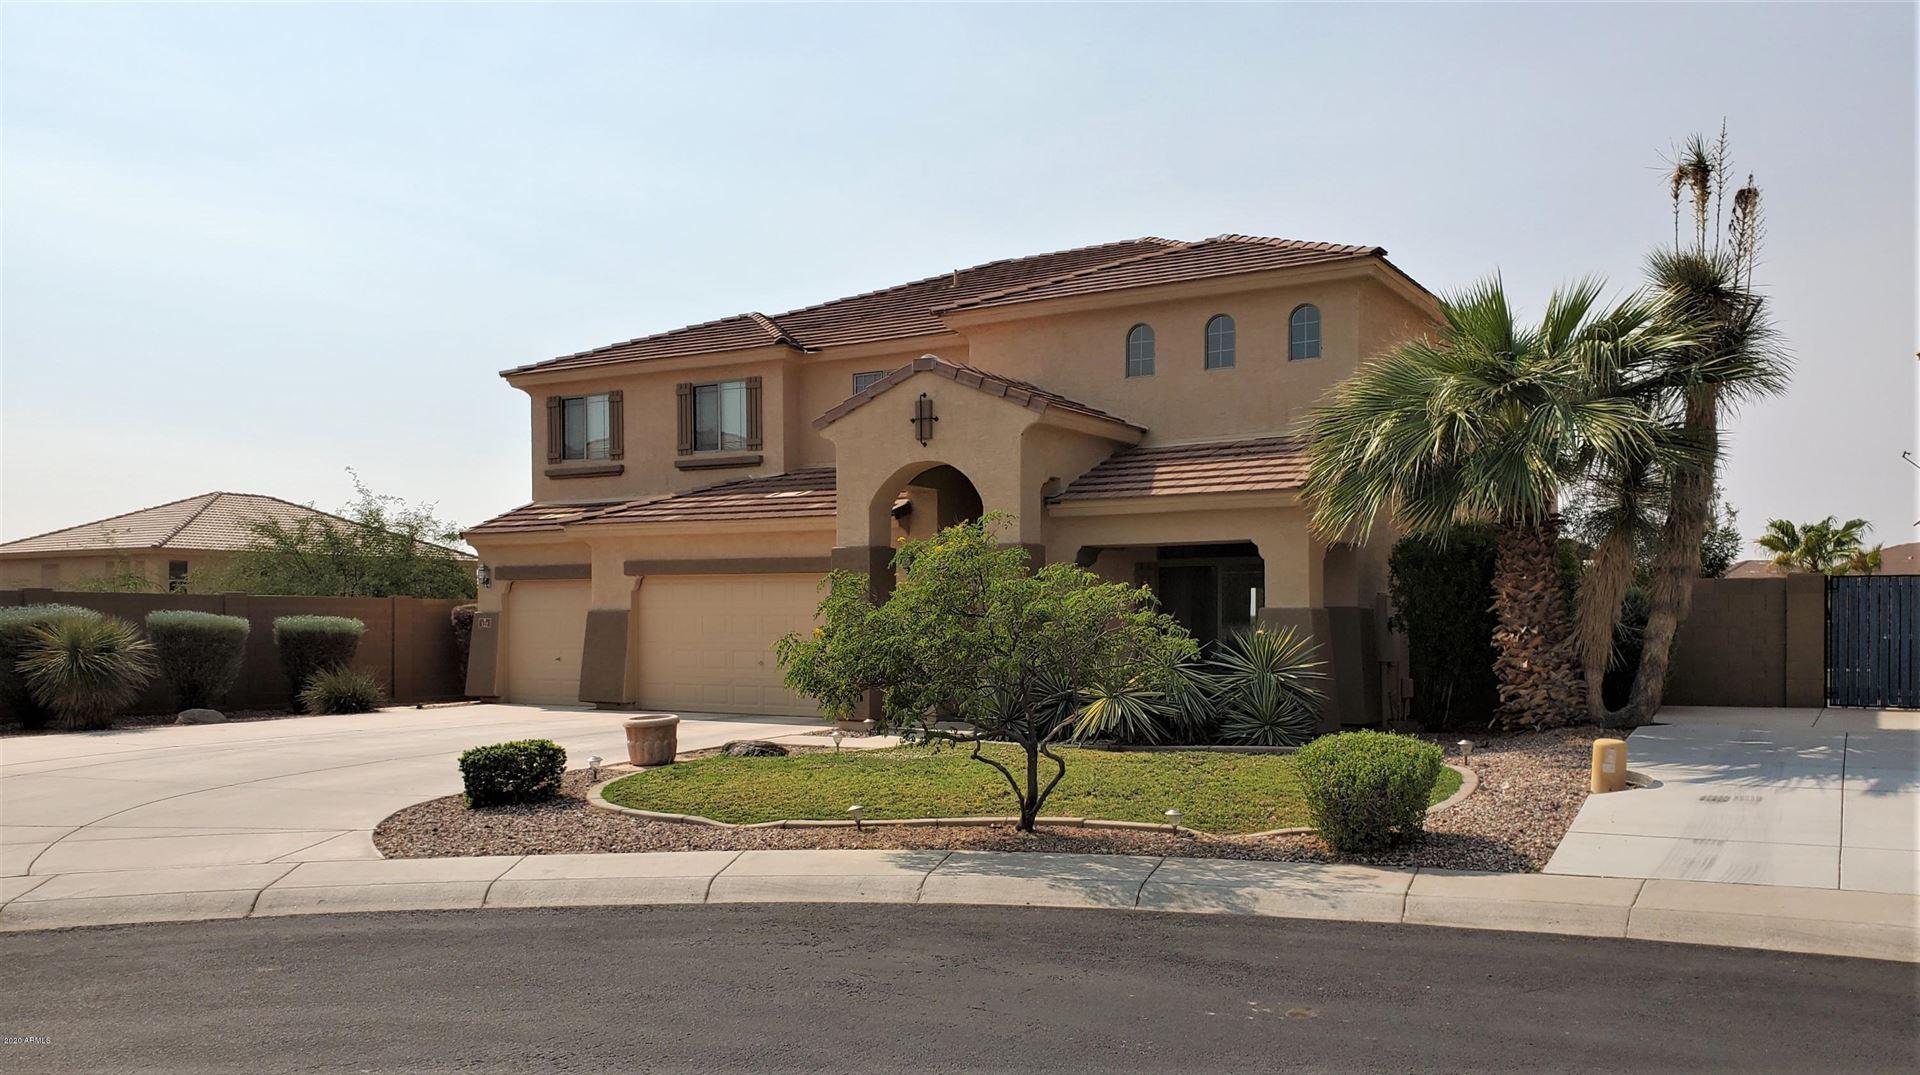 Photo for 122 N 235TH Drive, Buckeye, AZ 85396 (MLS # 6151446)